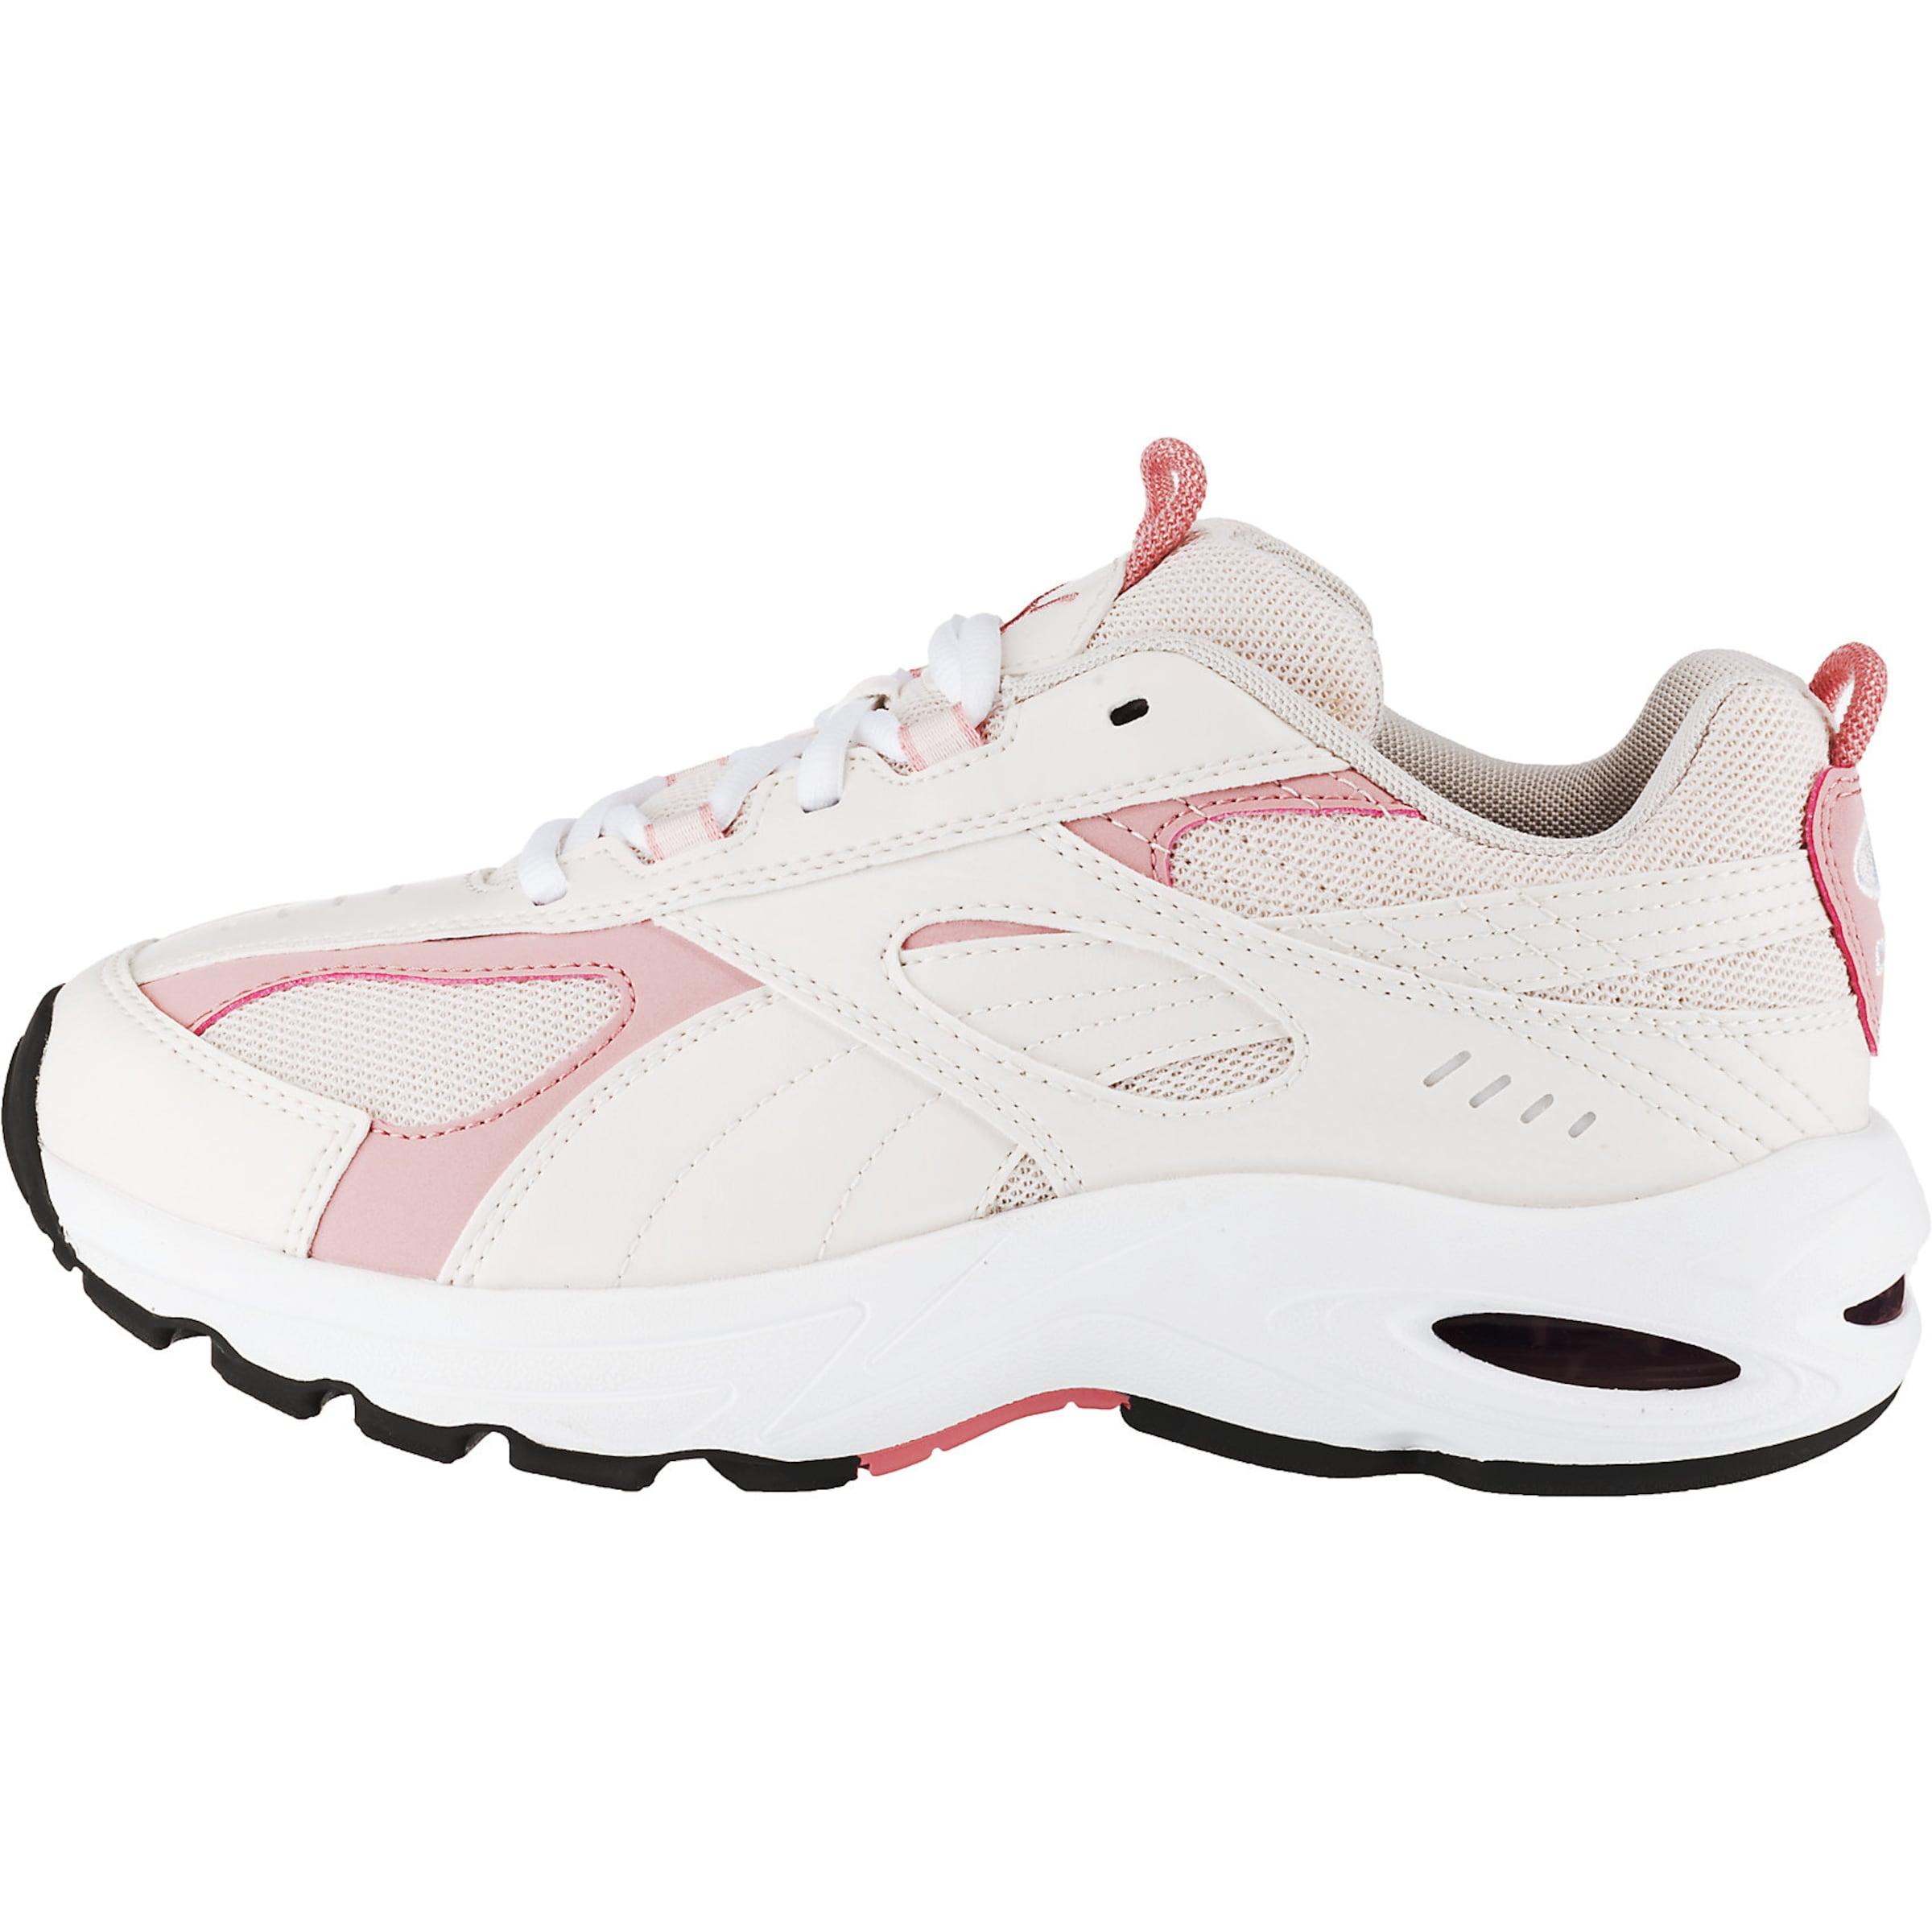 In 'cell Puma Sneakers AltrosaPastellpink Speed' b6mfgI7yYv